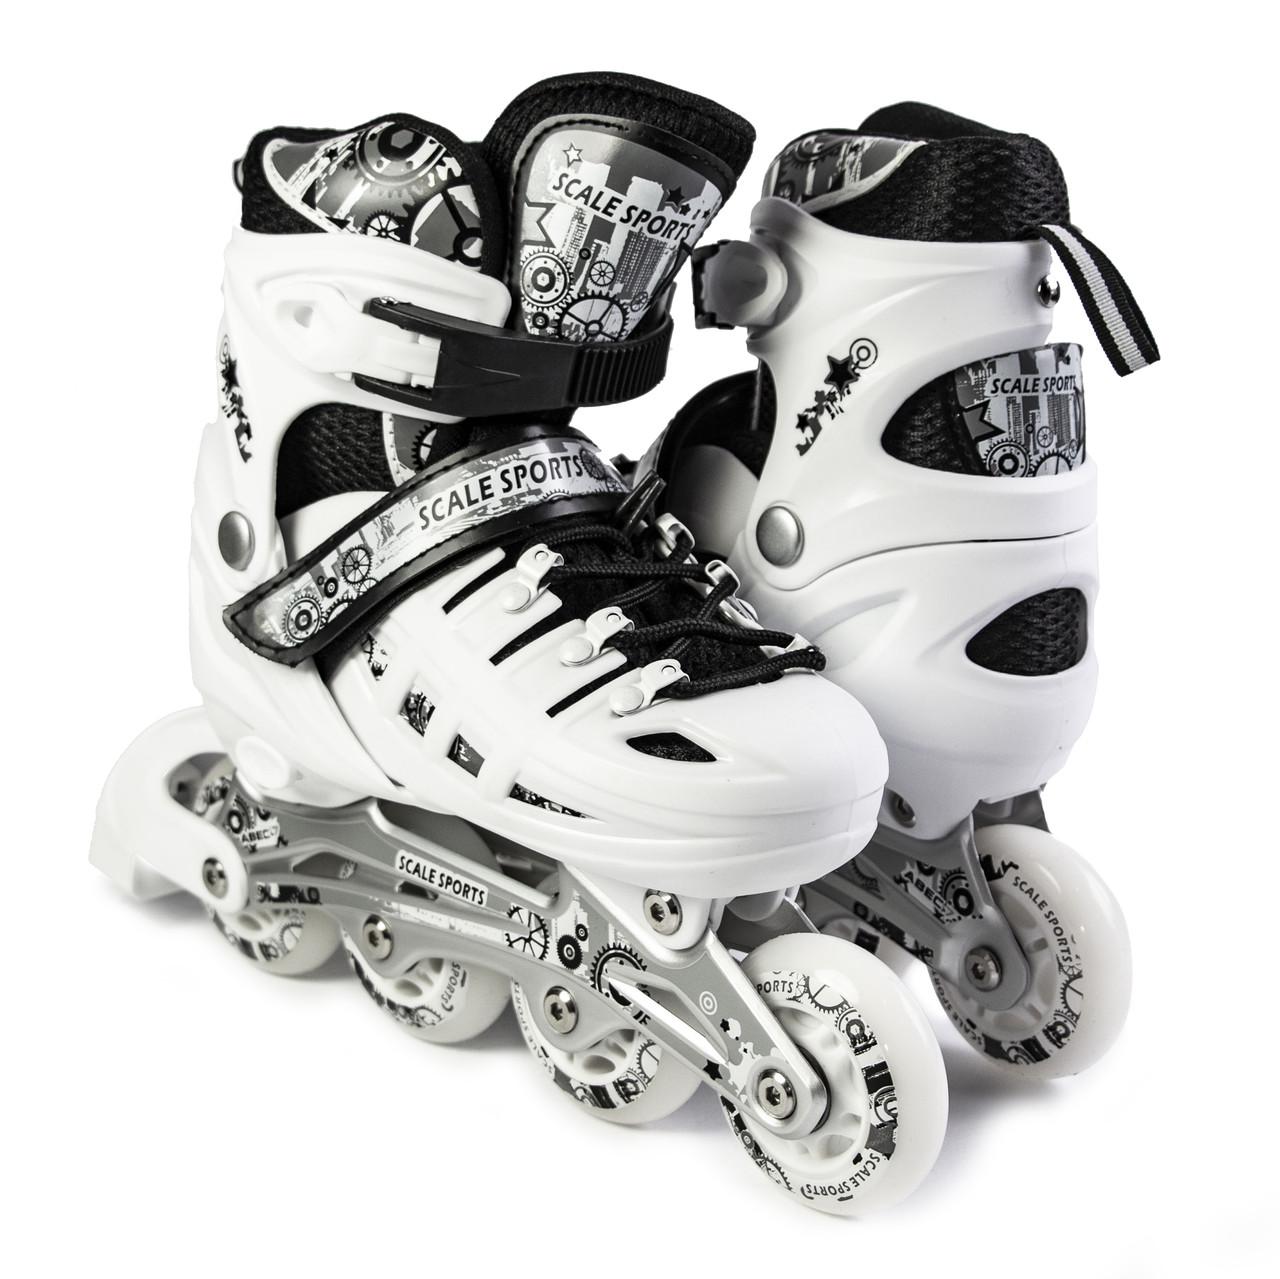 Ролики Scale Sports. White LF 905, размер 34-37